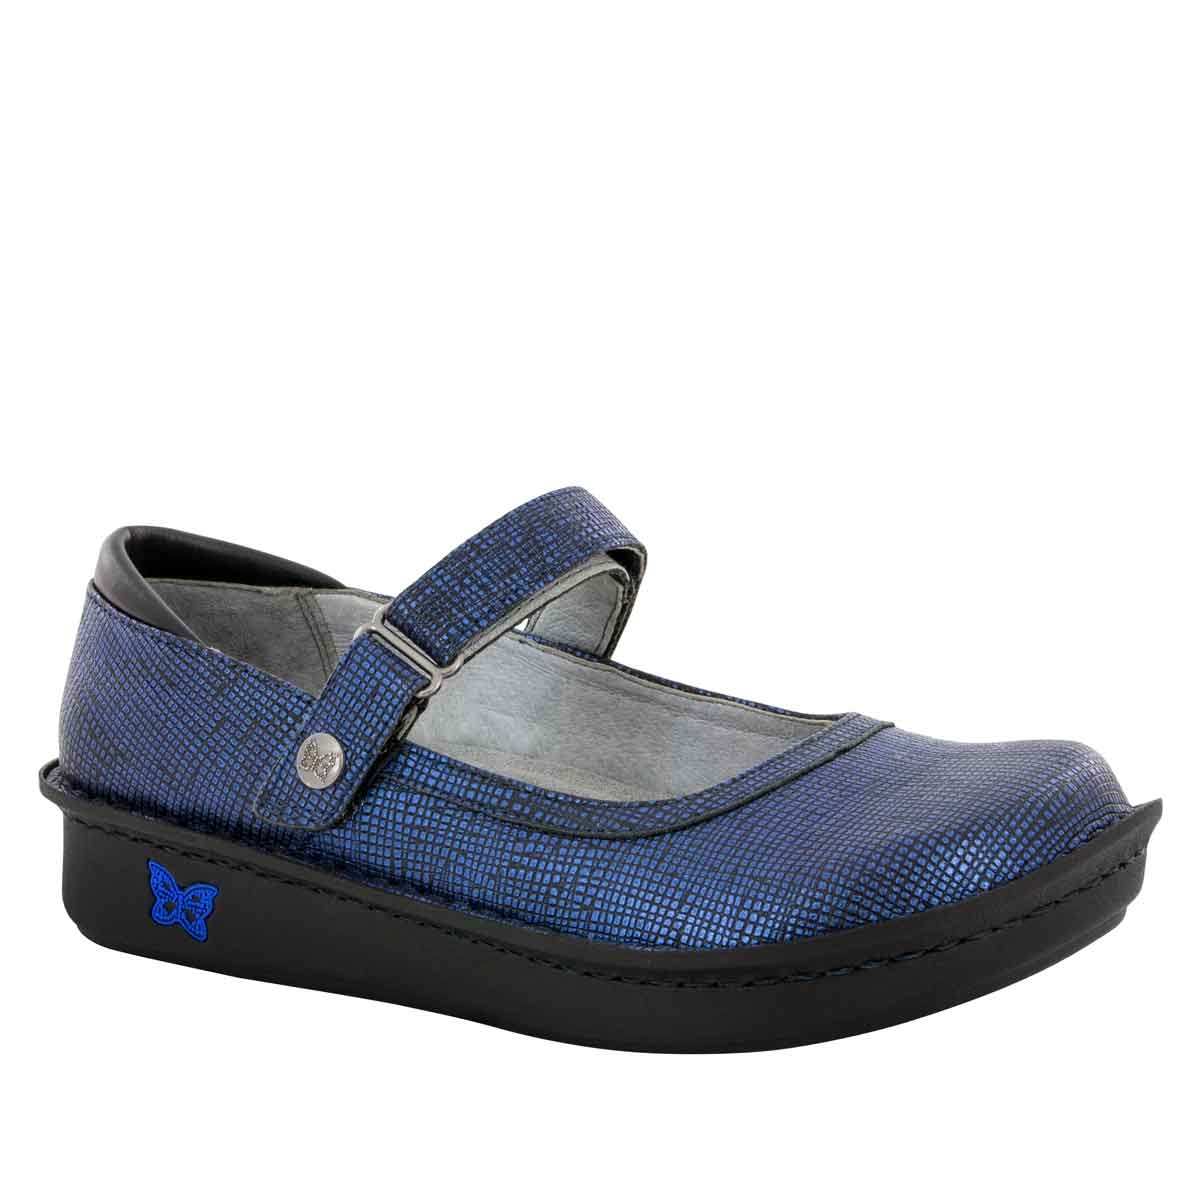 Alegria Belle Grid Blue The Alegria Shoe Experts